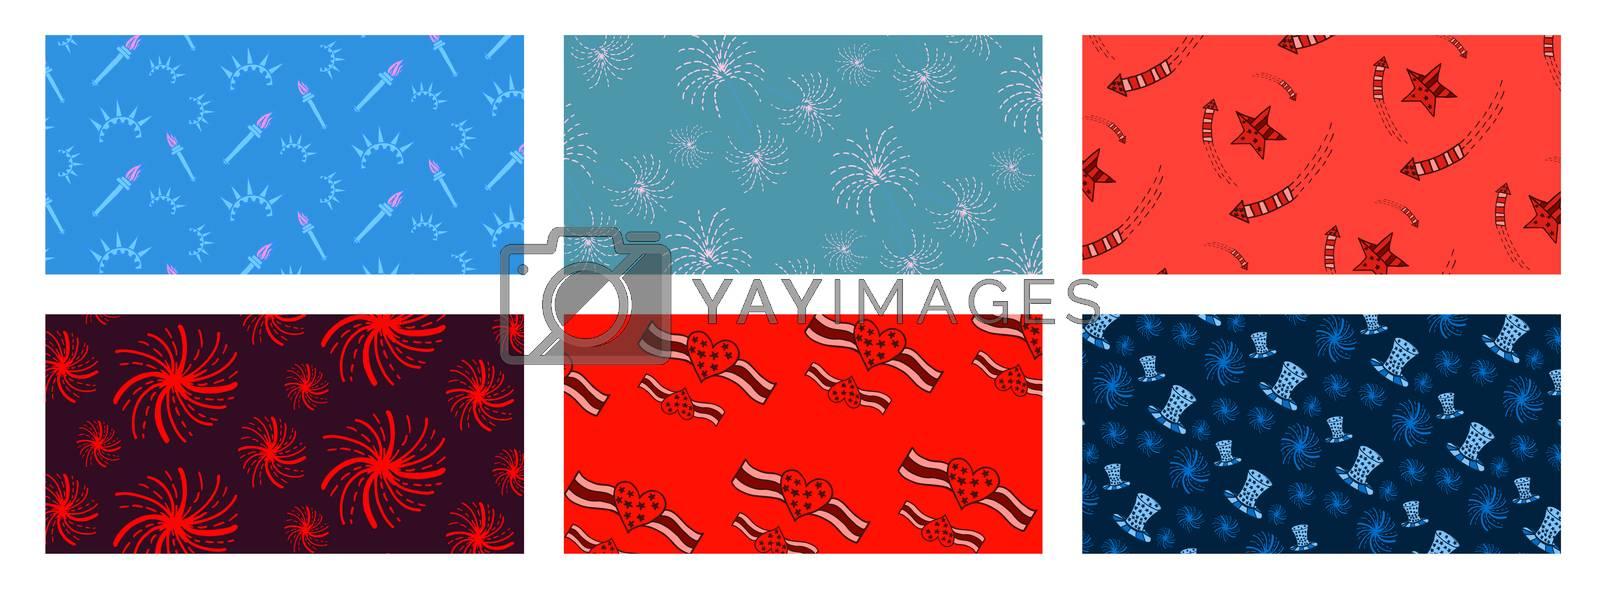 Vector icon of celebration by Wavebreakmedia